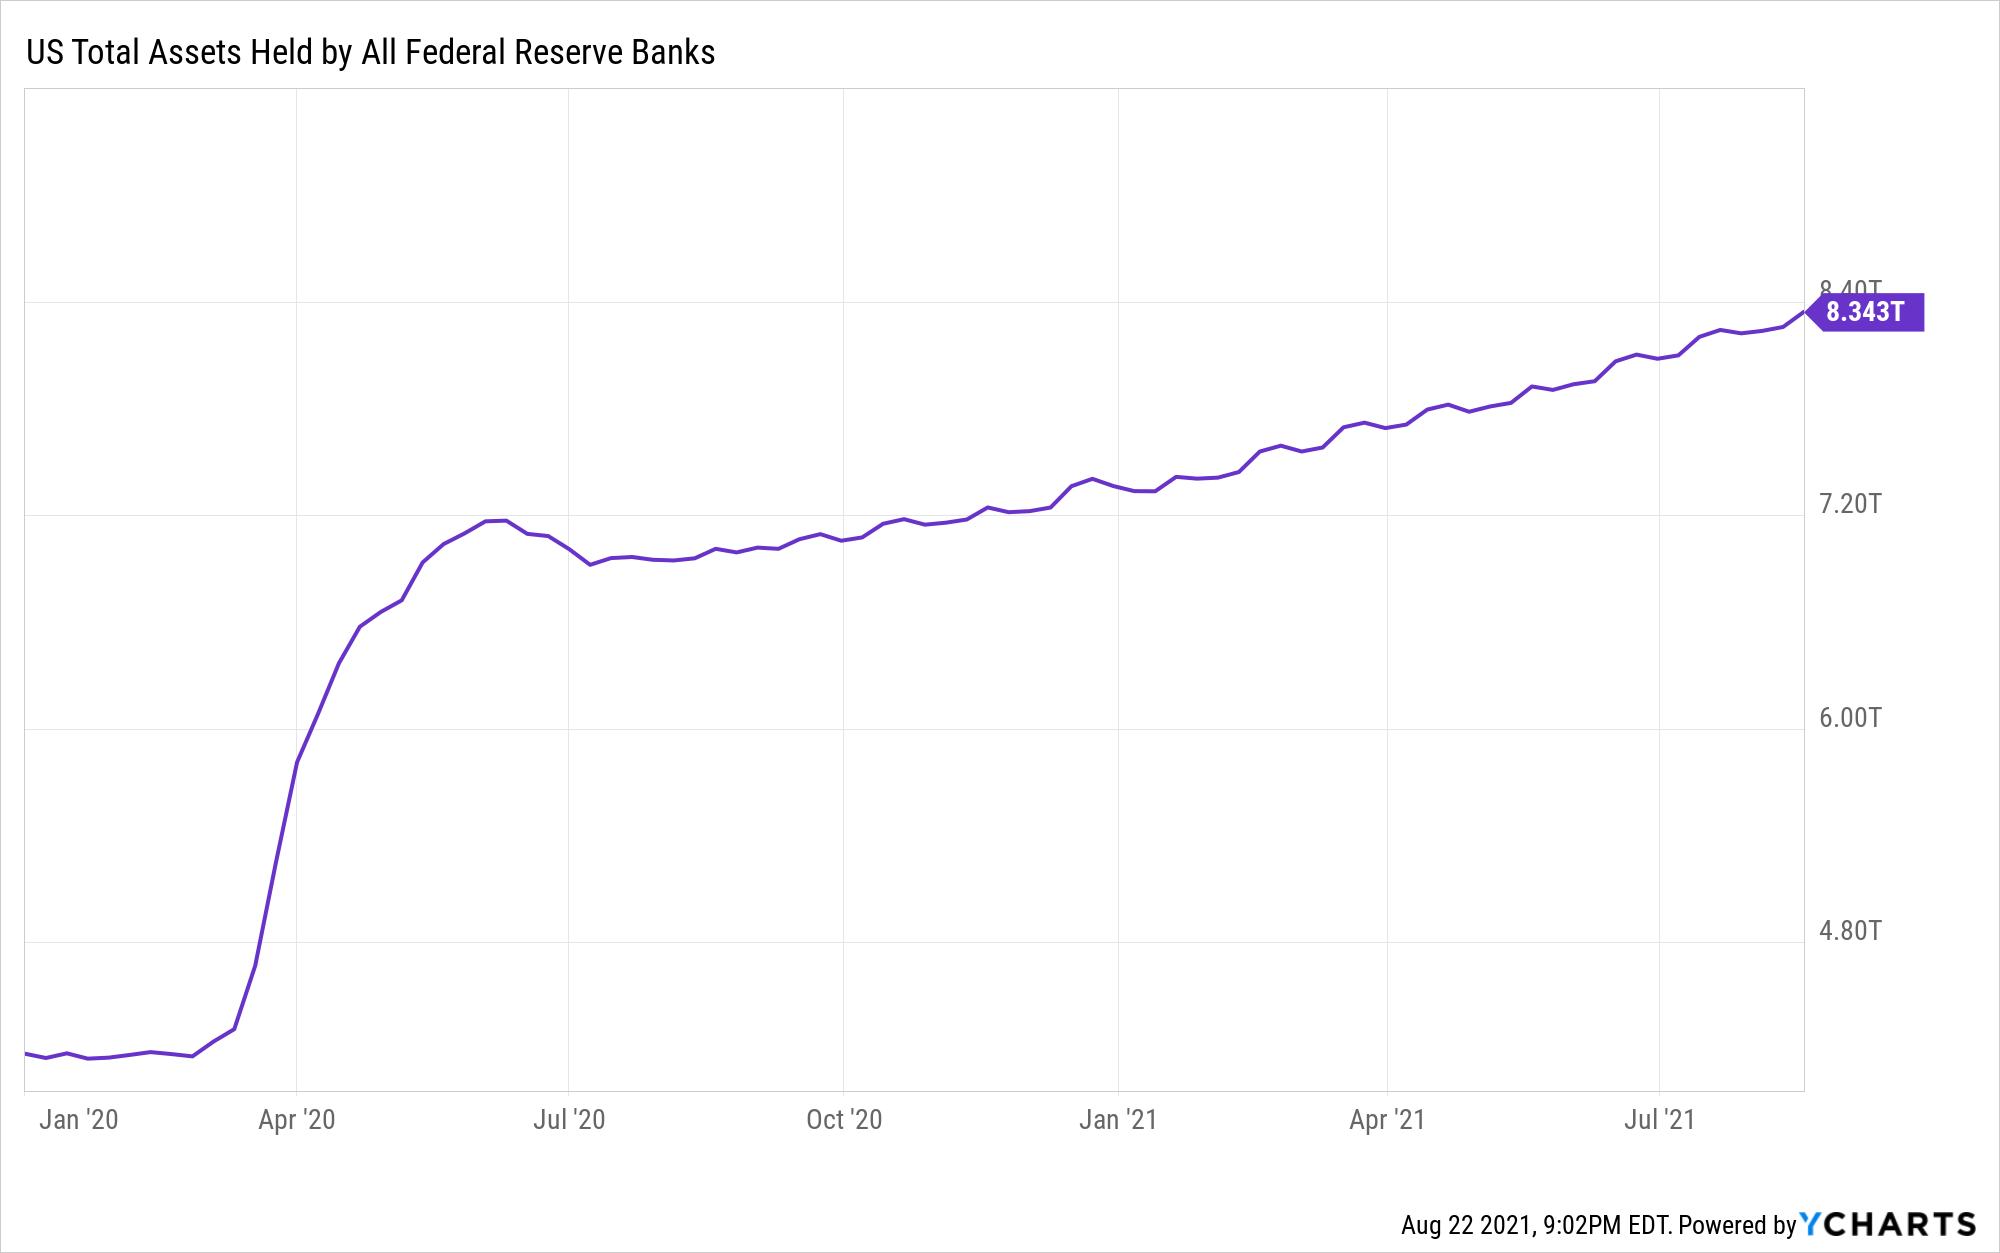 US Federal Reserve Total Assets